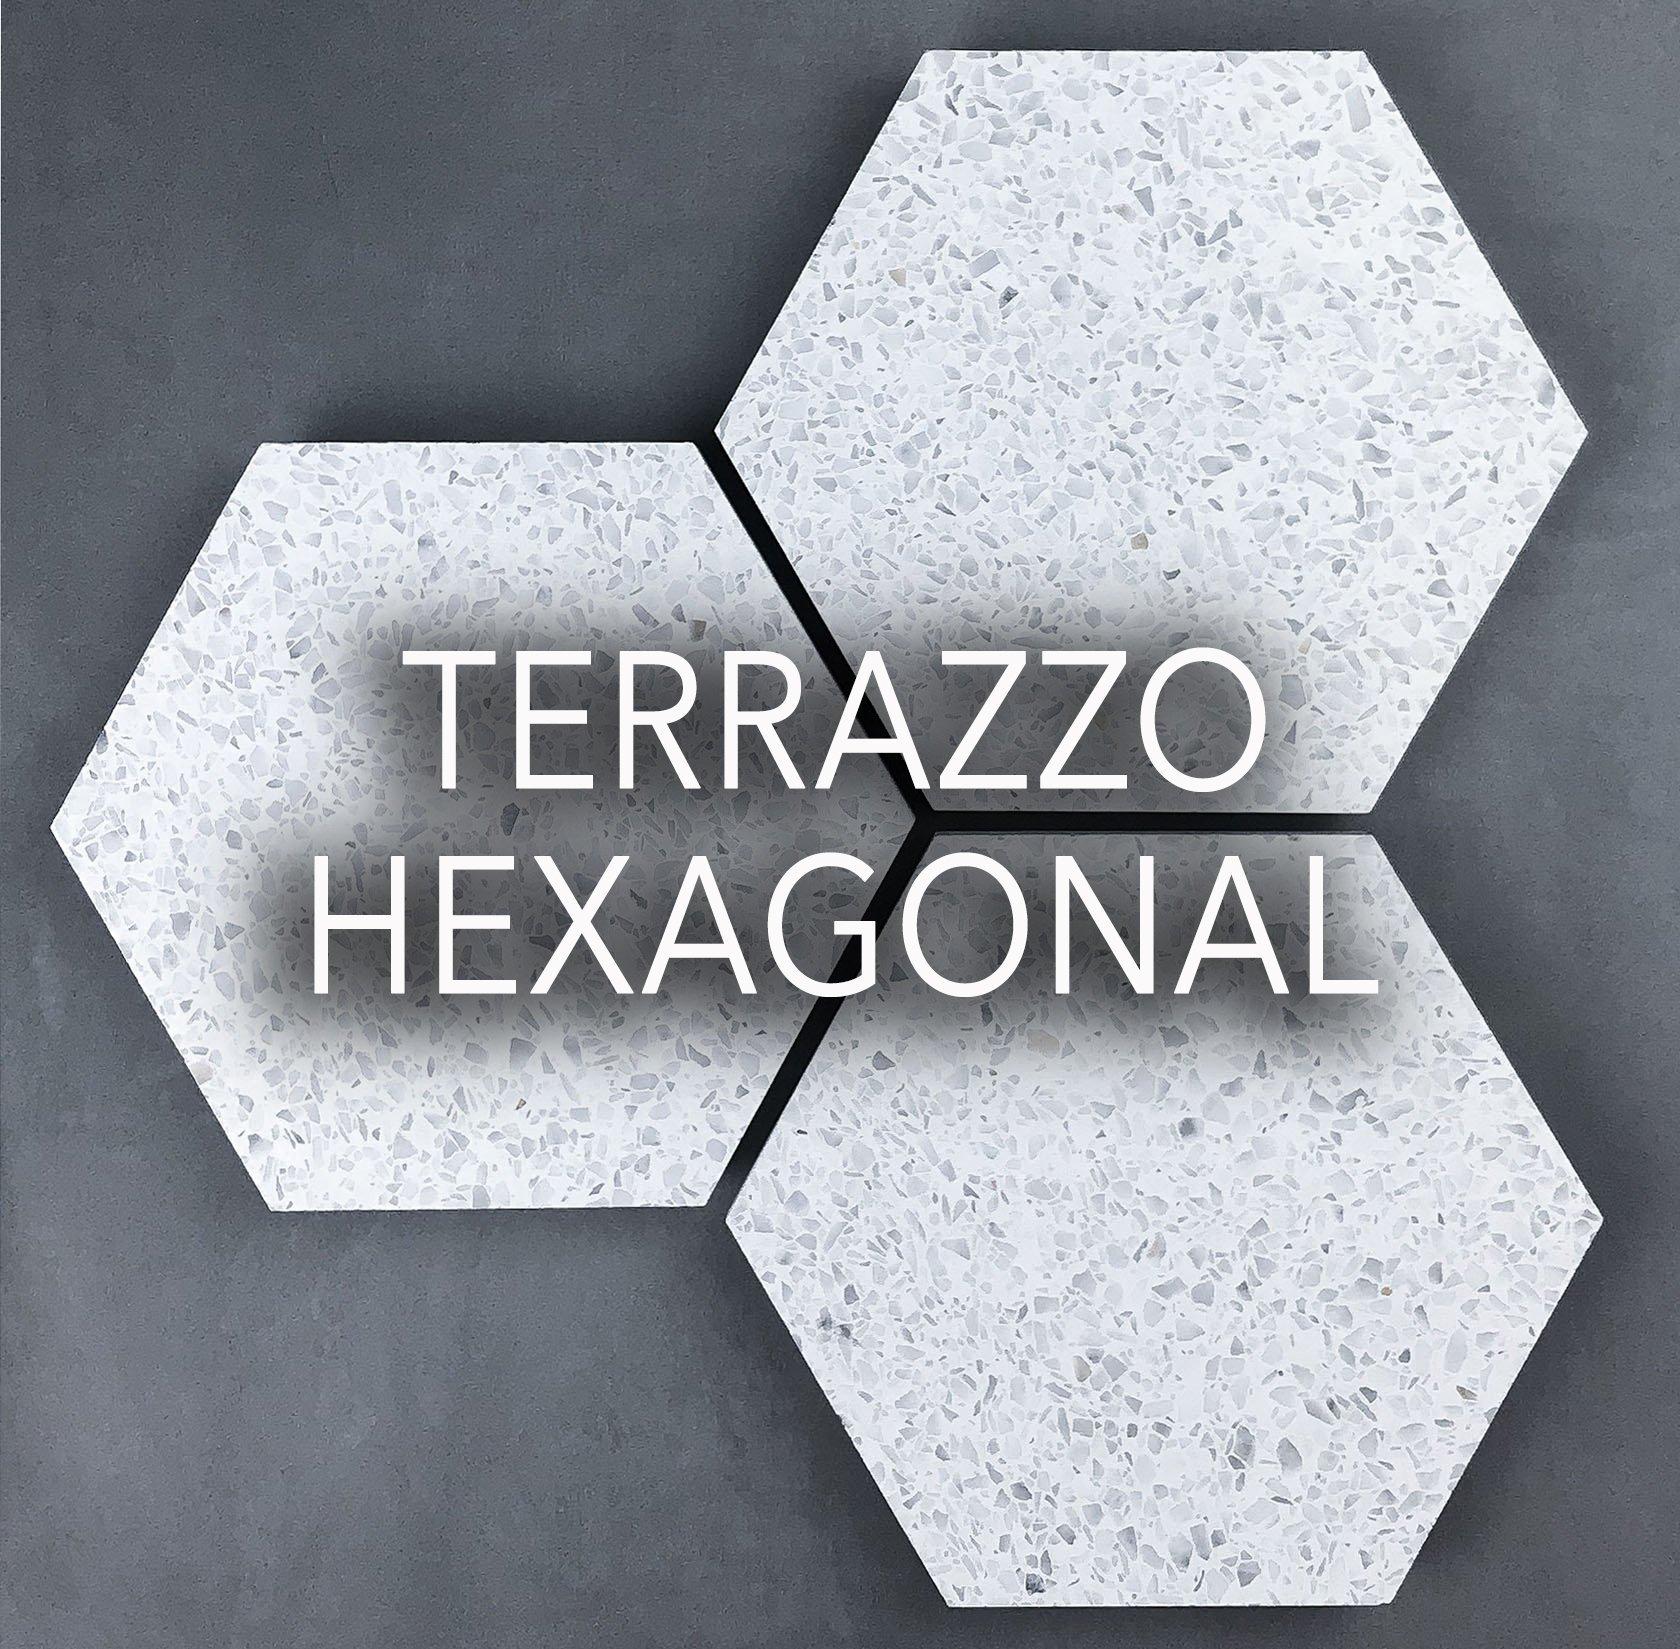 Hexagonal Terrazzo